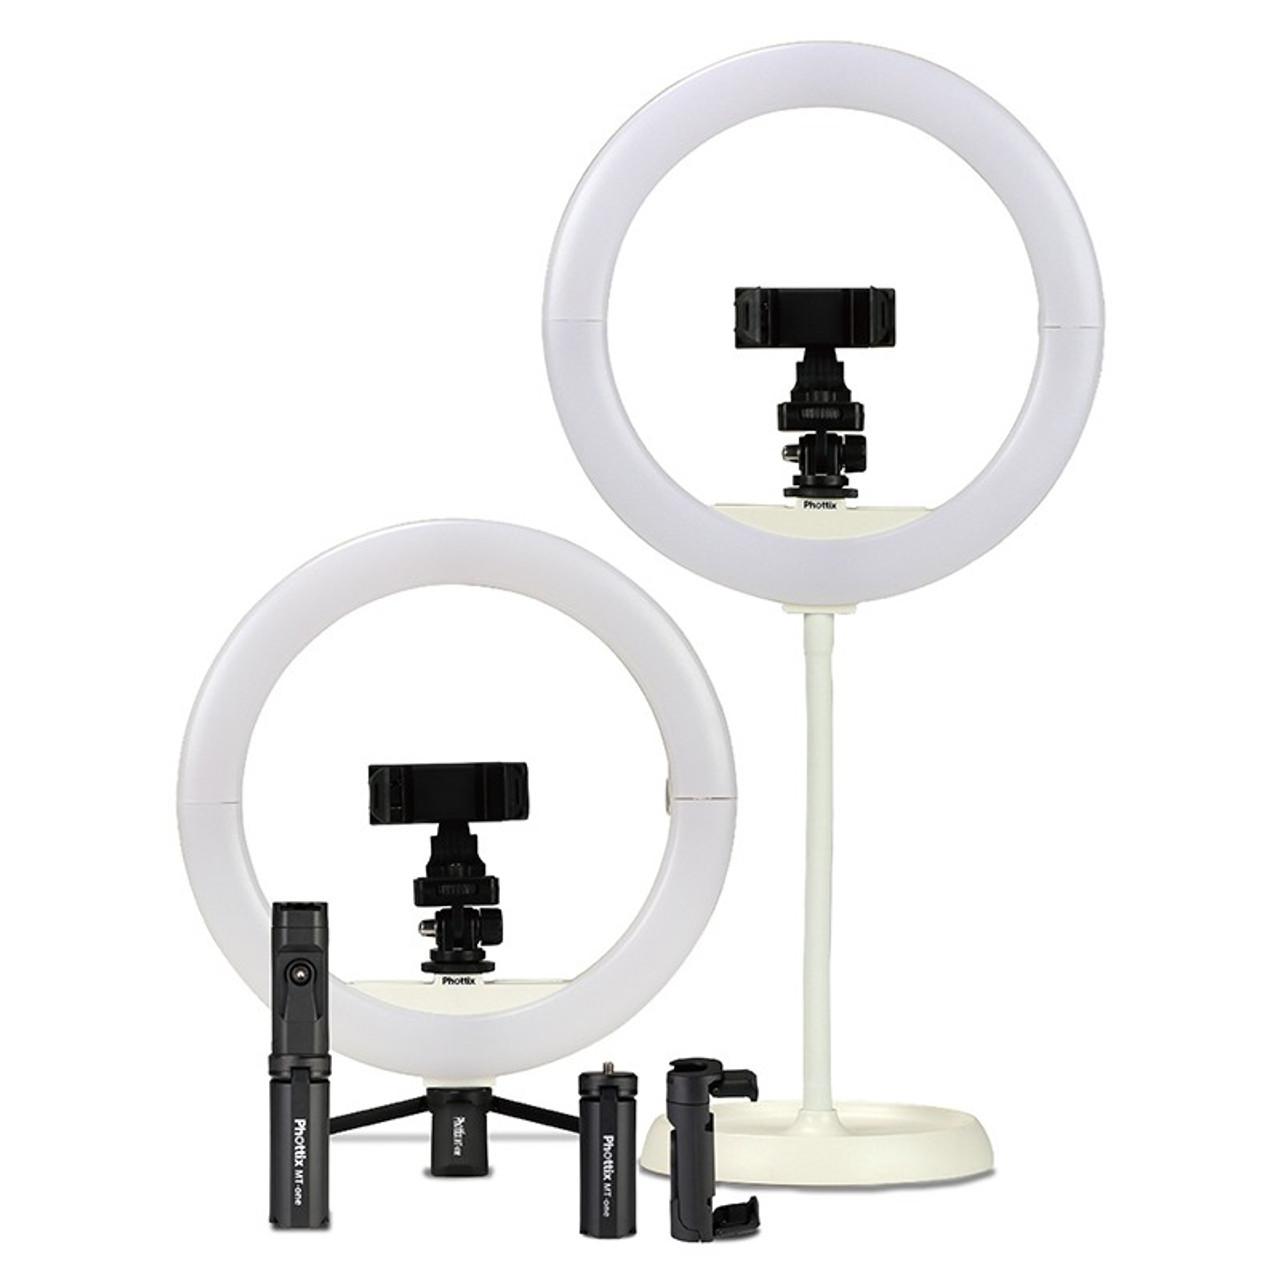 Phottix Nuada Ring 10 LED Light Kit